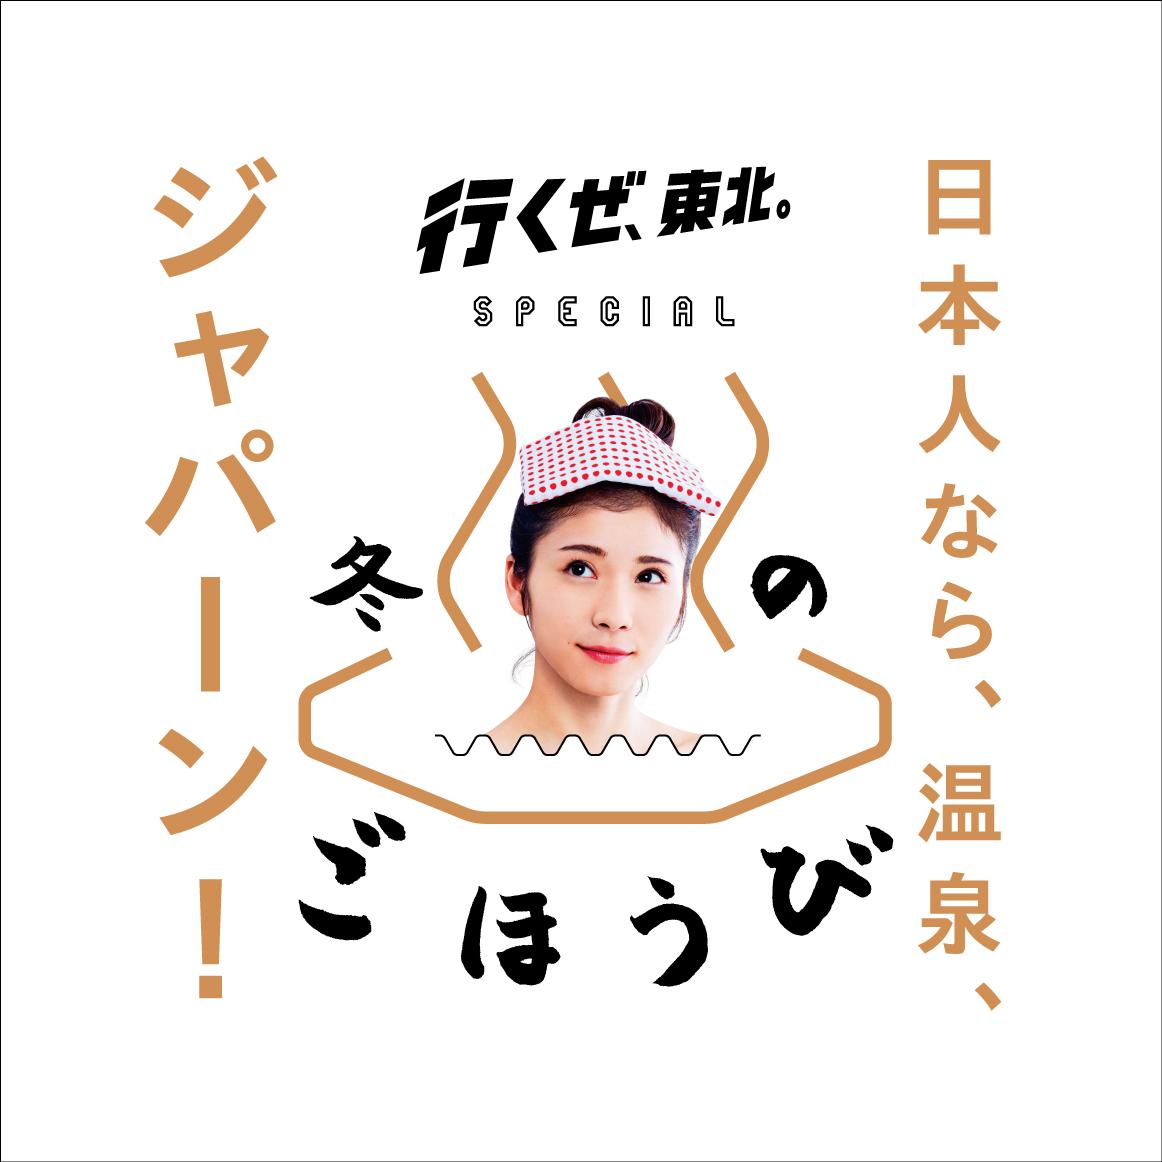 JR_ikuze_2016_fuyu_no_gohobi_guidbook_nakatobira_onsen